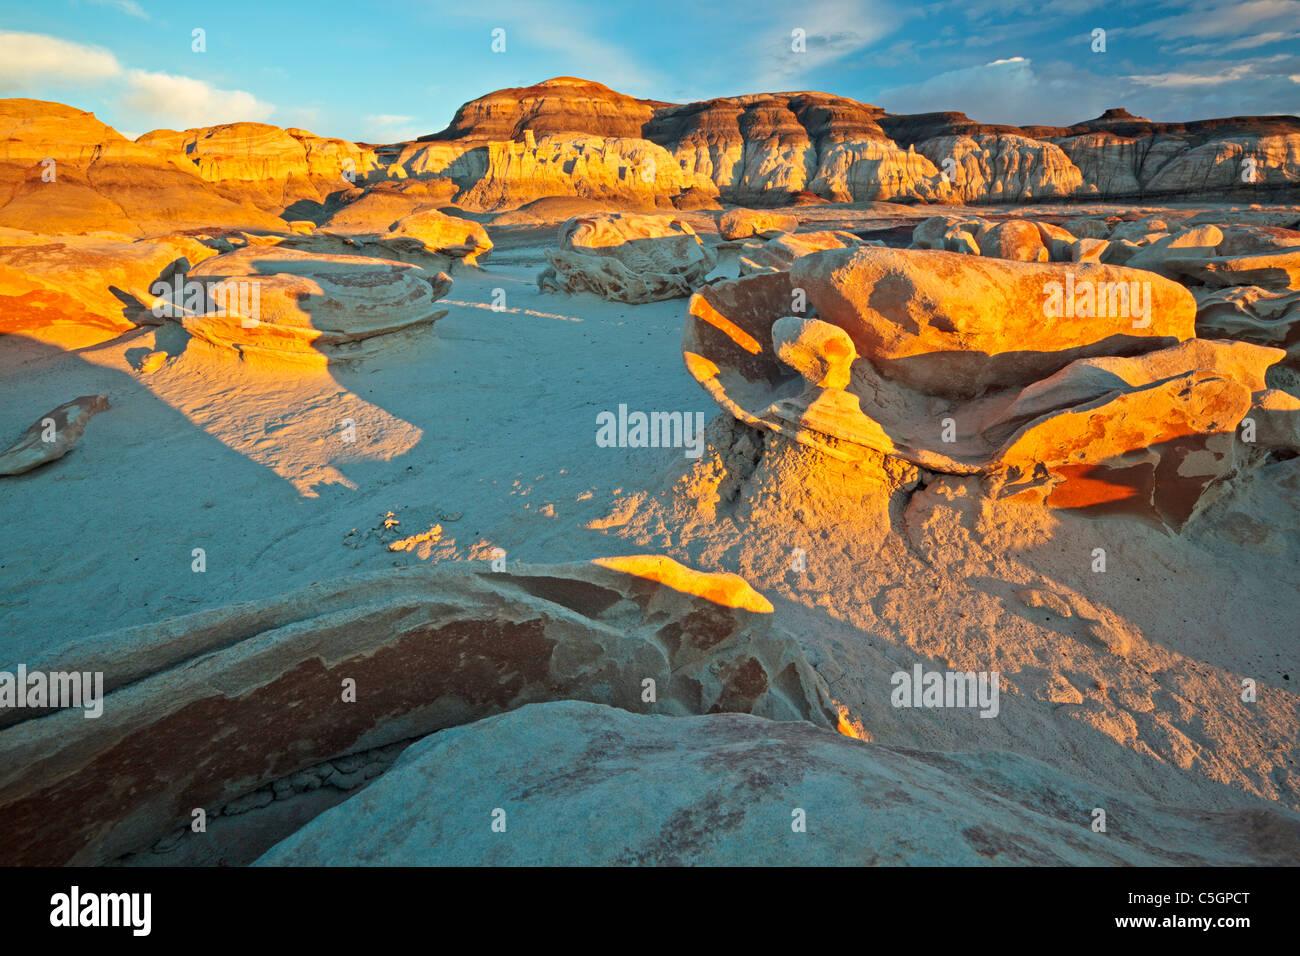 Bisti & De Na Zin Wilderness, New Mexico, USA - Stock Image